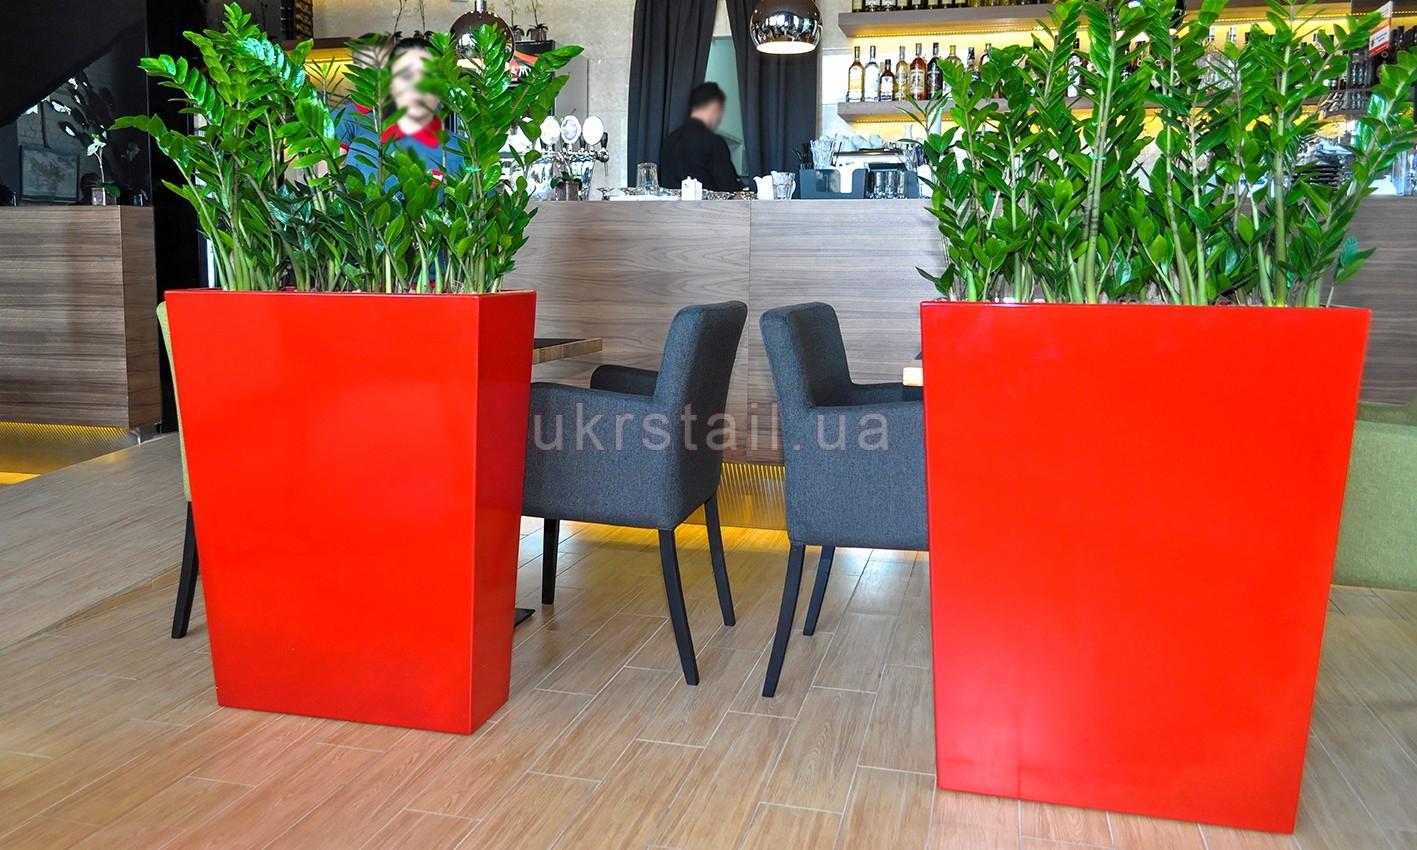 Подцветочники ресторана Мураками в ТРЦ Ocean Plaza 05